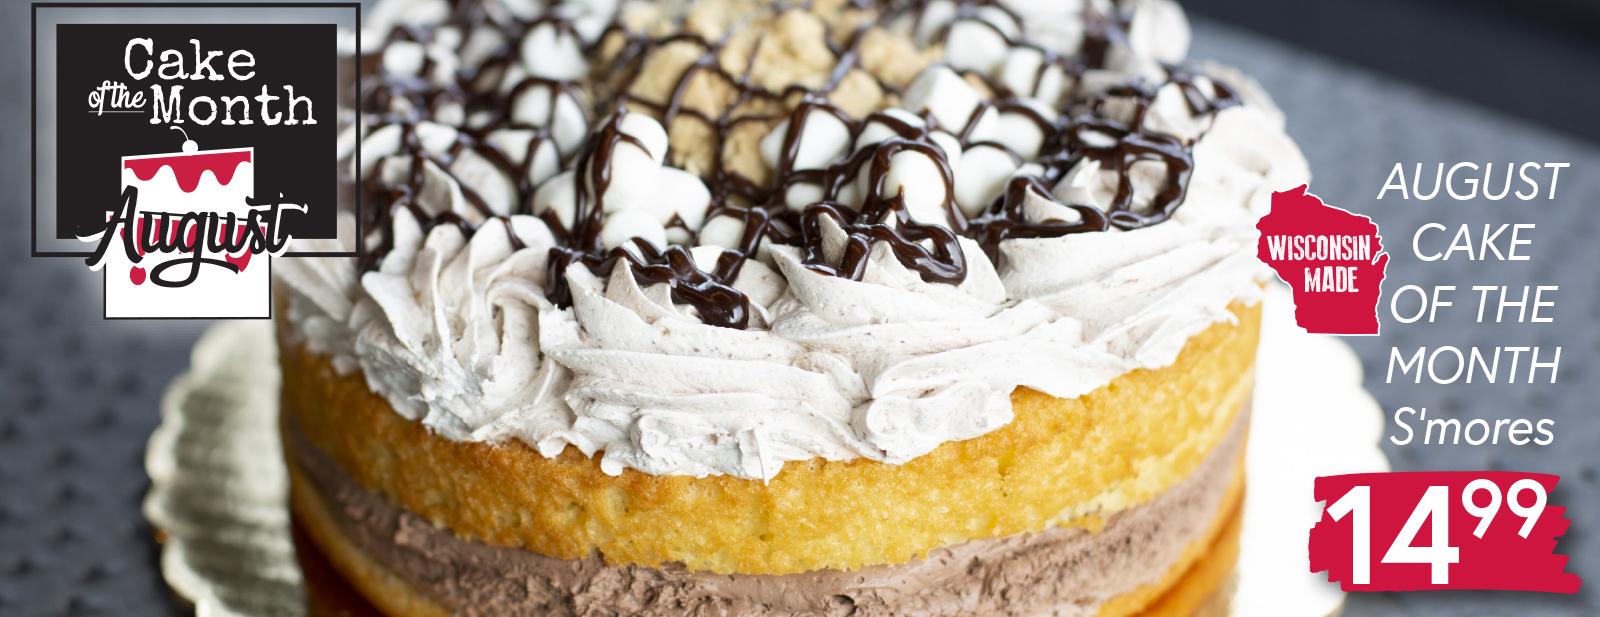 S'mores Cake $14.99